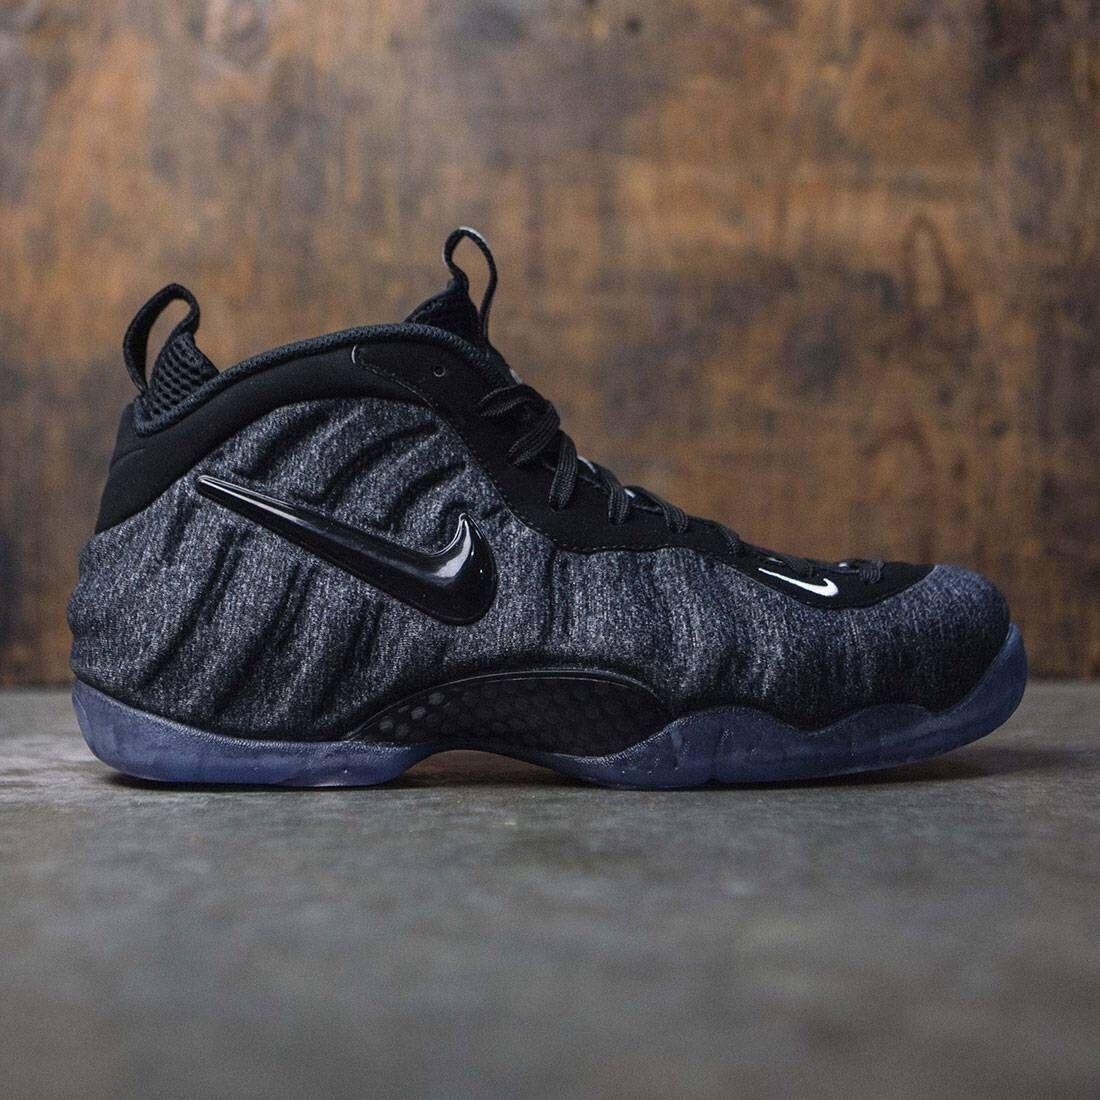 2018 Nike oscuro Air Foamposite pro lana gris oscuro Nike talla 14.624041-0Jordan Penny 0b333d